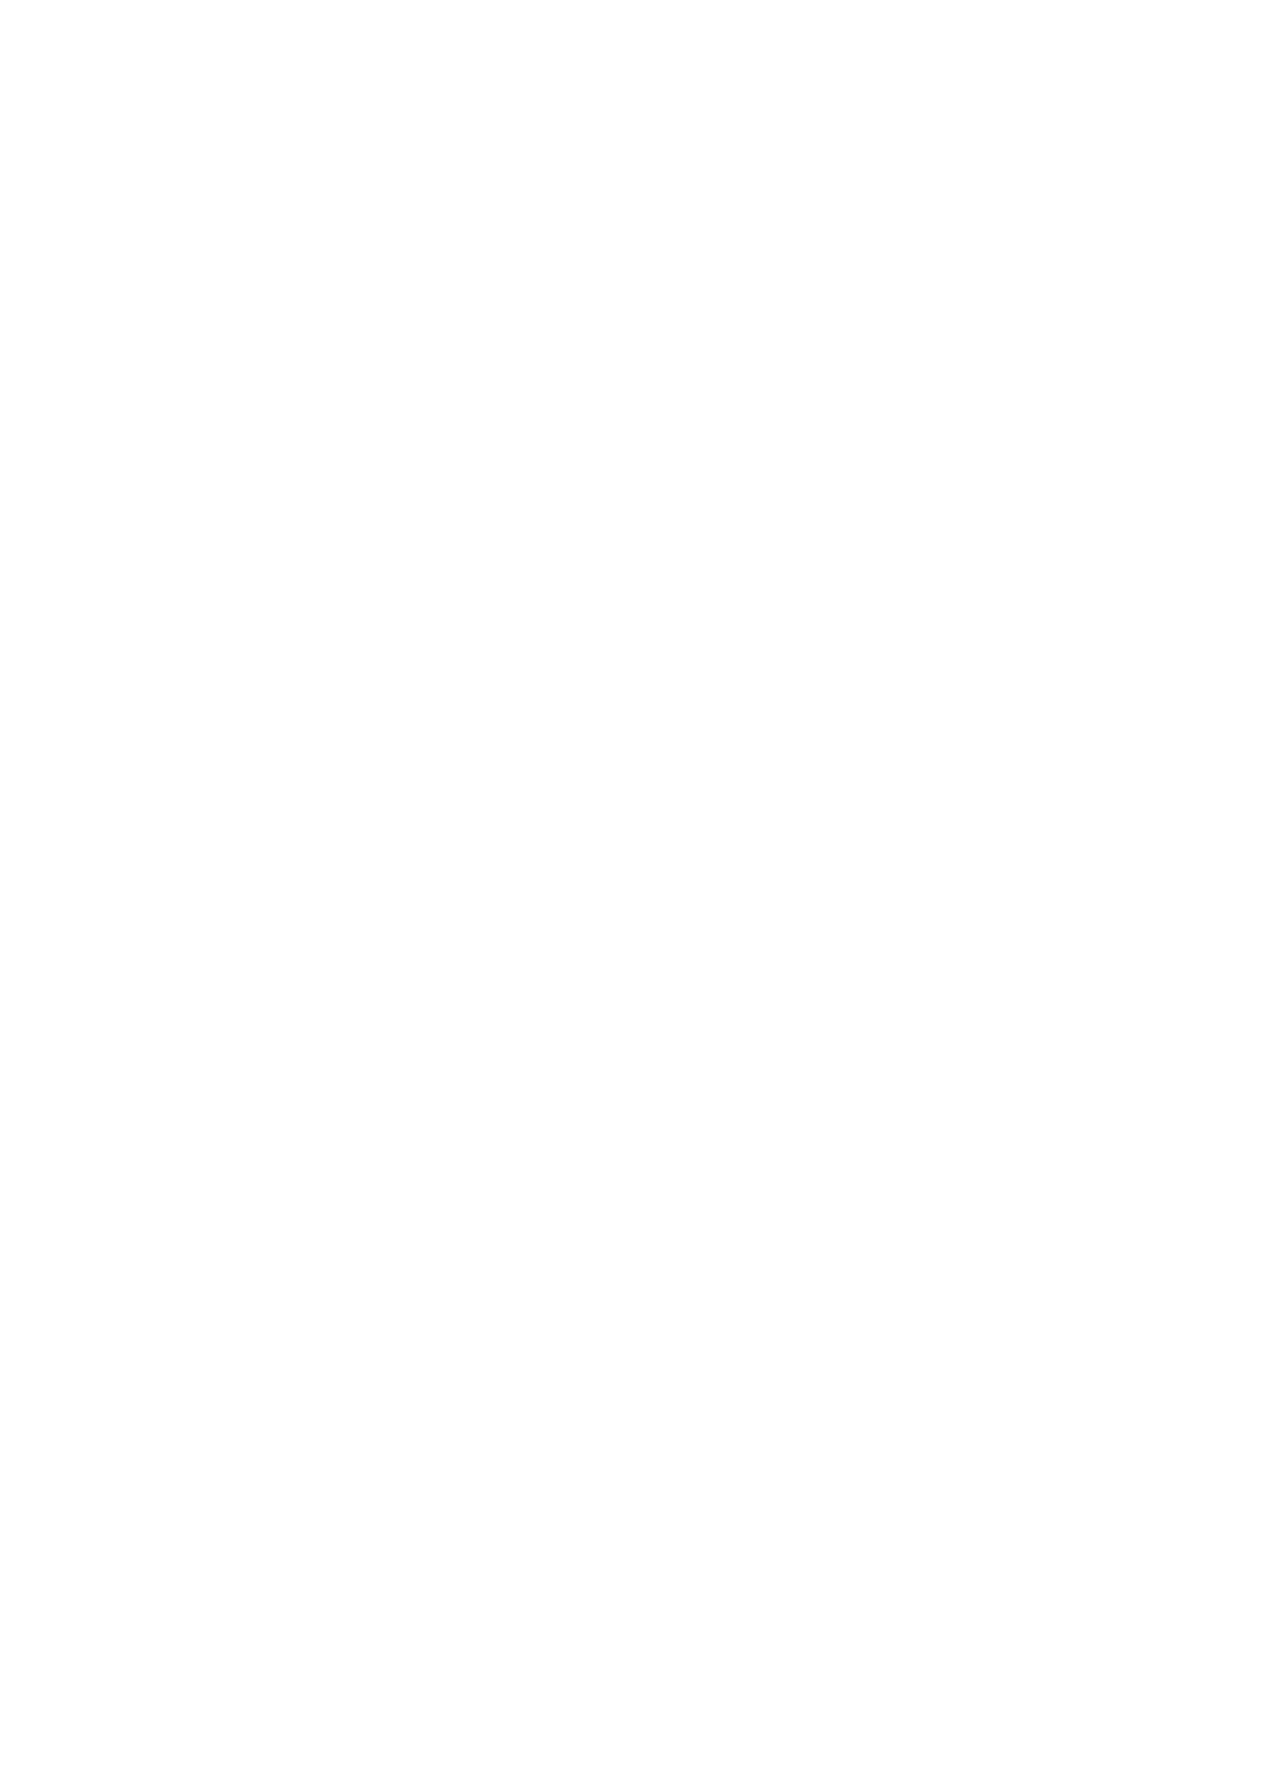 epiphany white logo.png